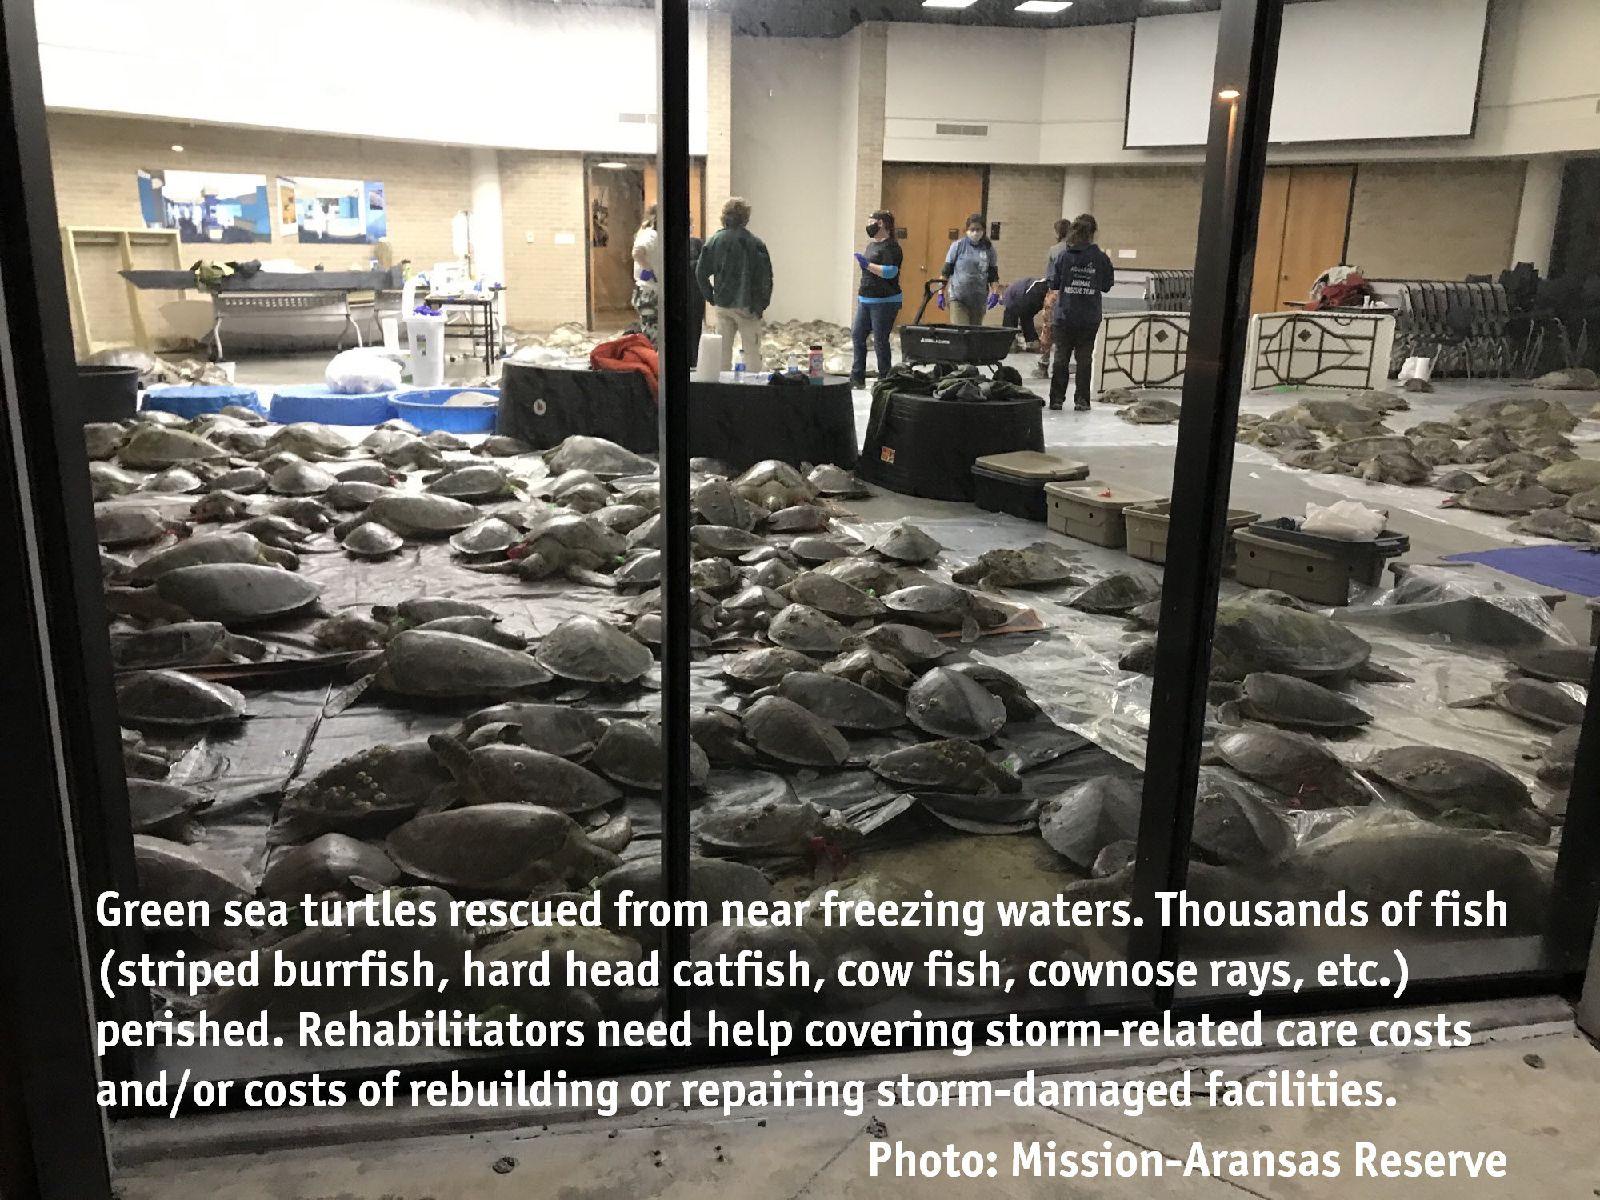 green sea turtles on floor of makeshift intake area